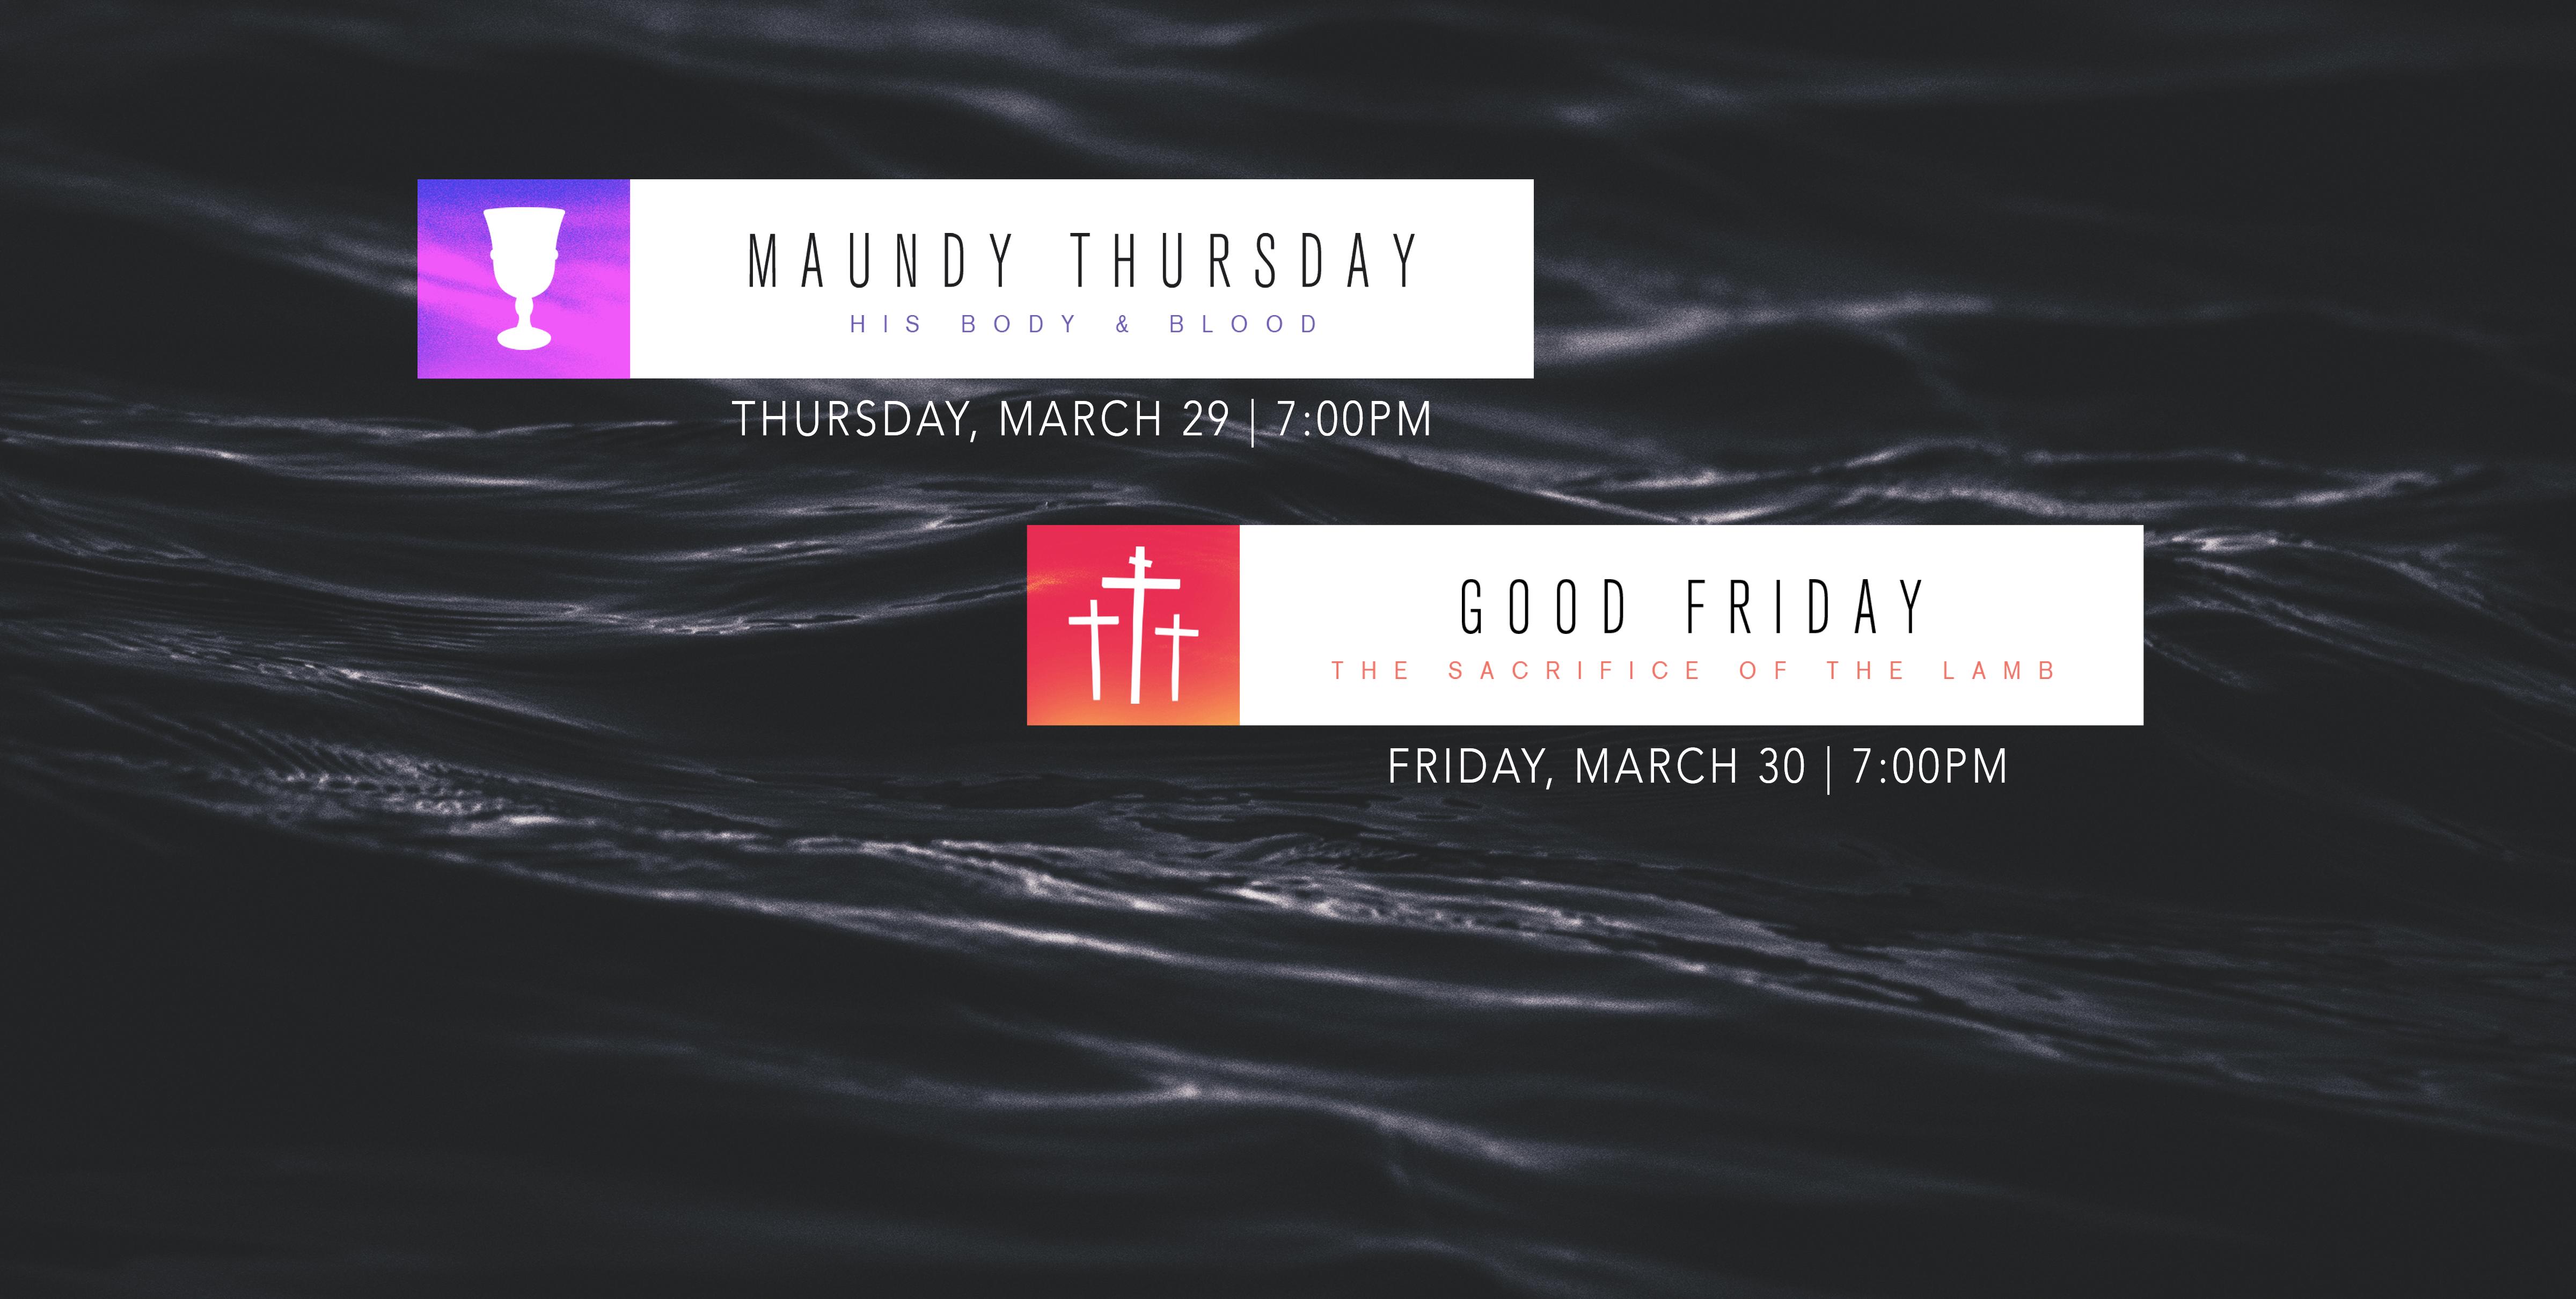 Maundy Thursday / Good Friday